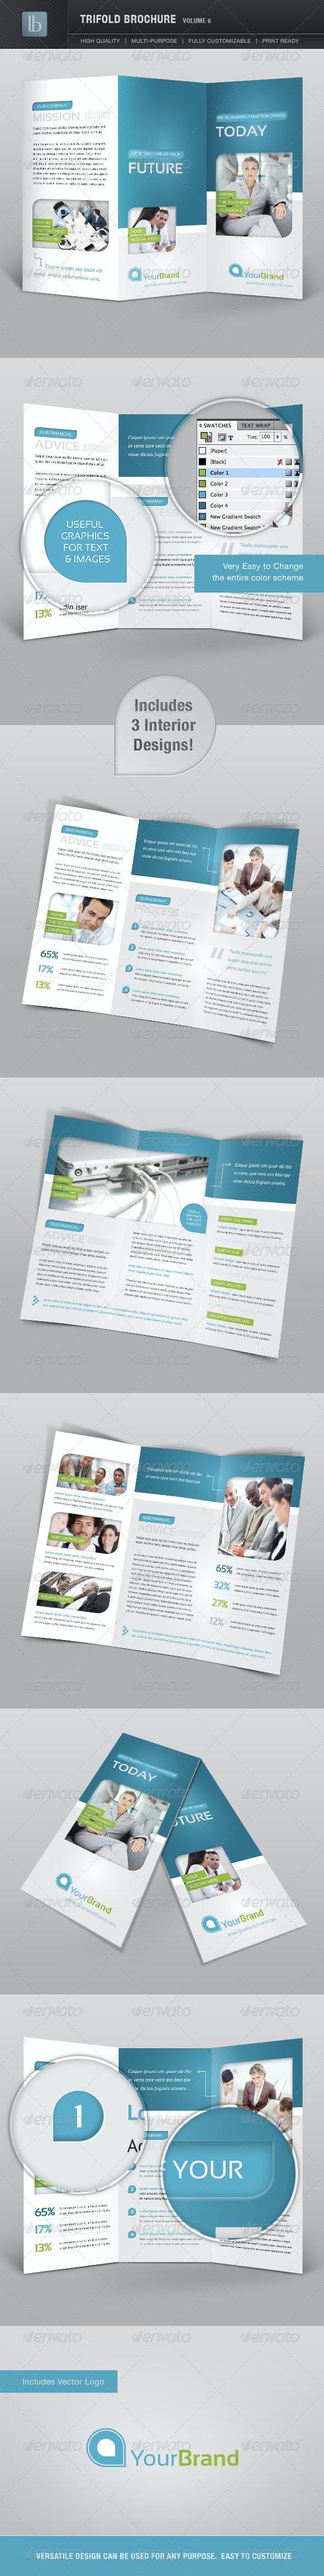 Trifold Brochure | Volume 6 - Brochures Print Templates